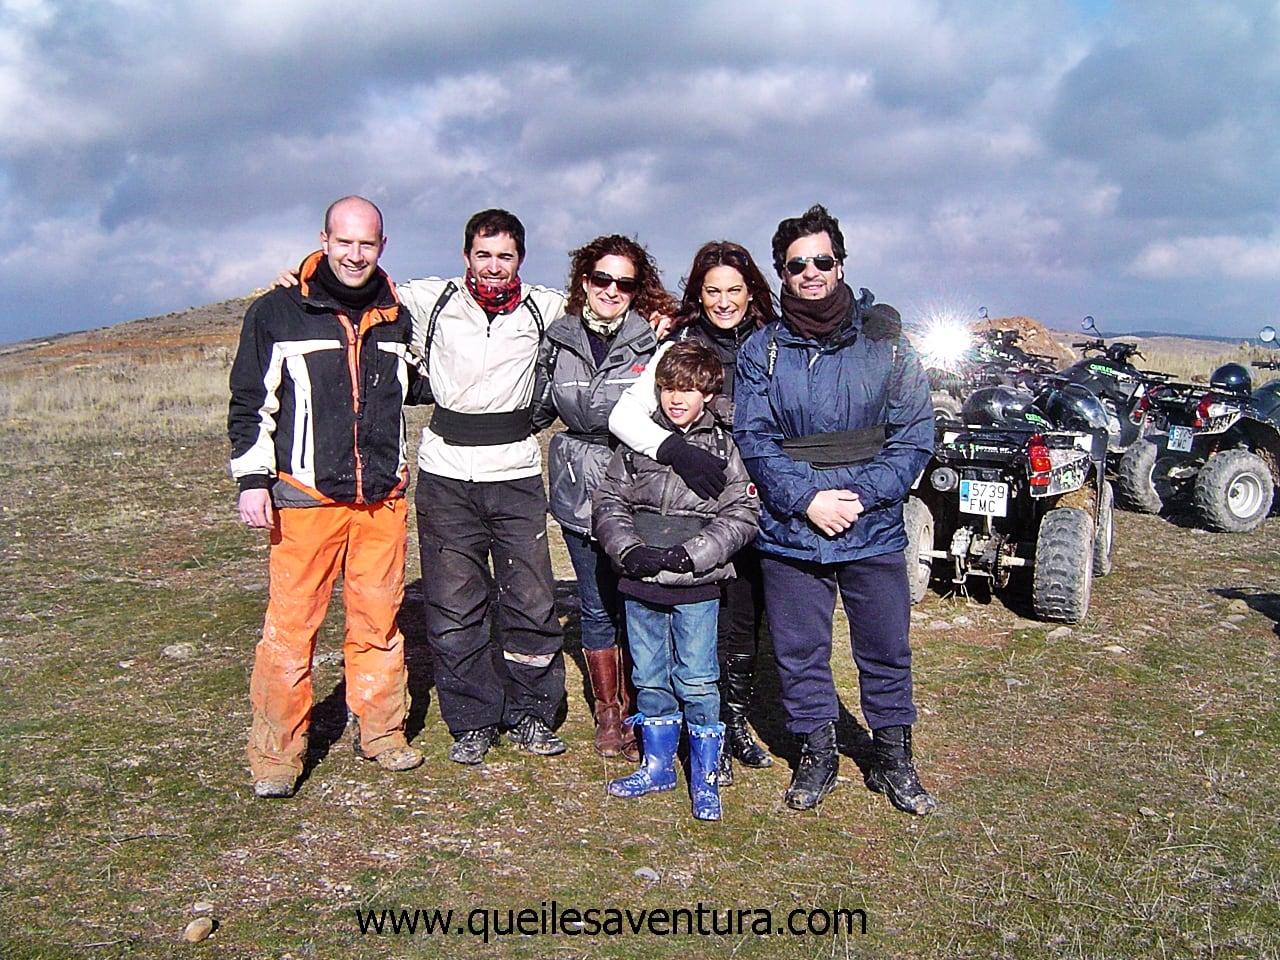 queilesaventura-ruta-quad-navarra0025bardenas_24_02